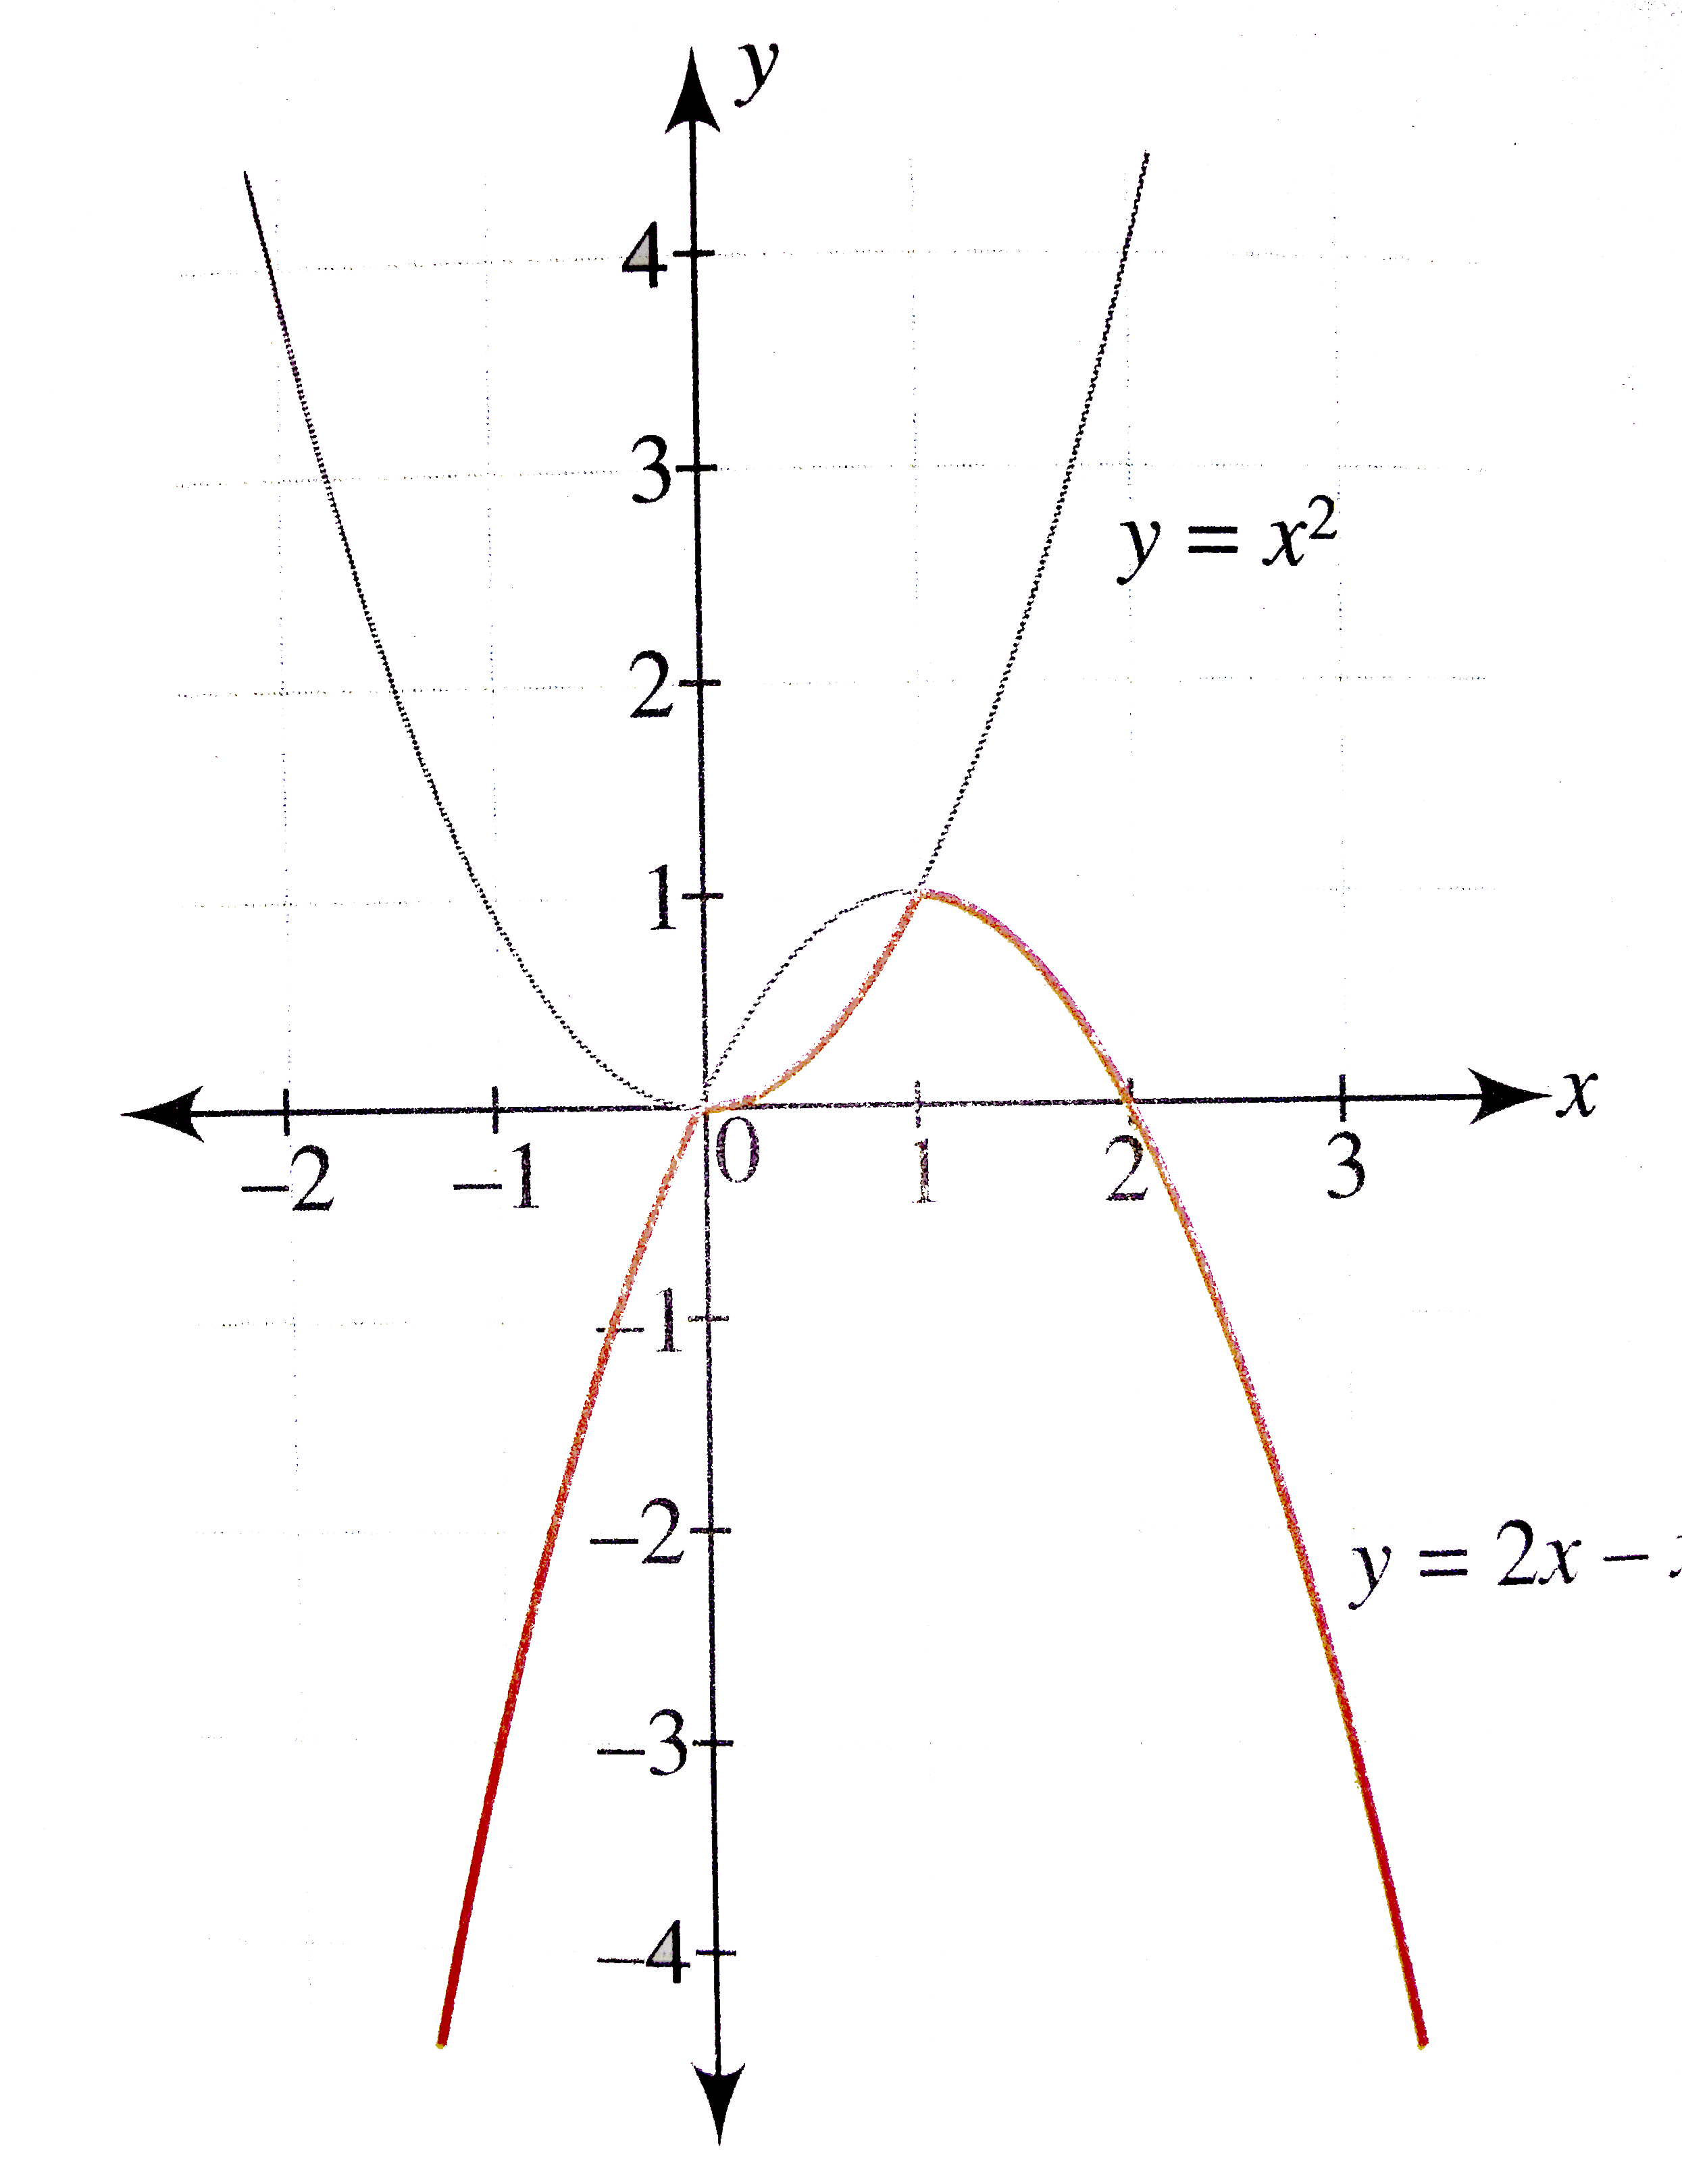 Draw The Graph Of The Function F X X X X 2 1 Le X Le 1